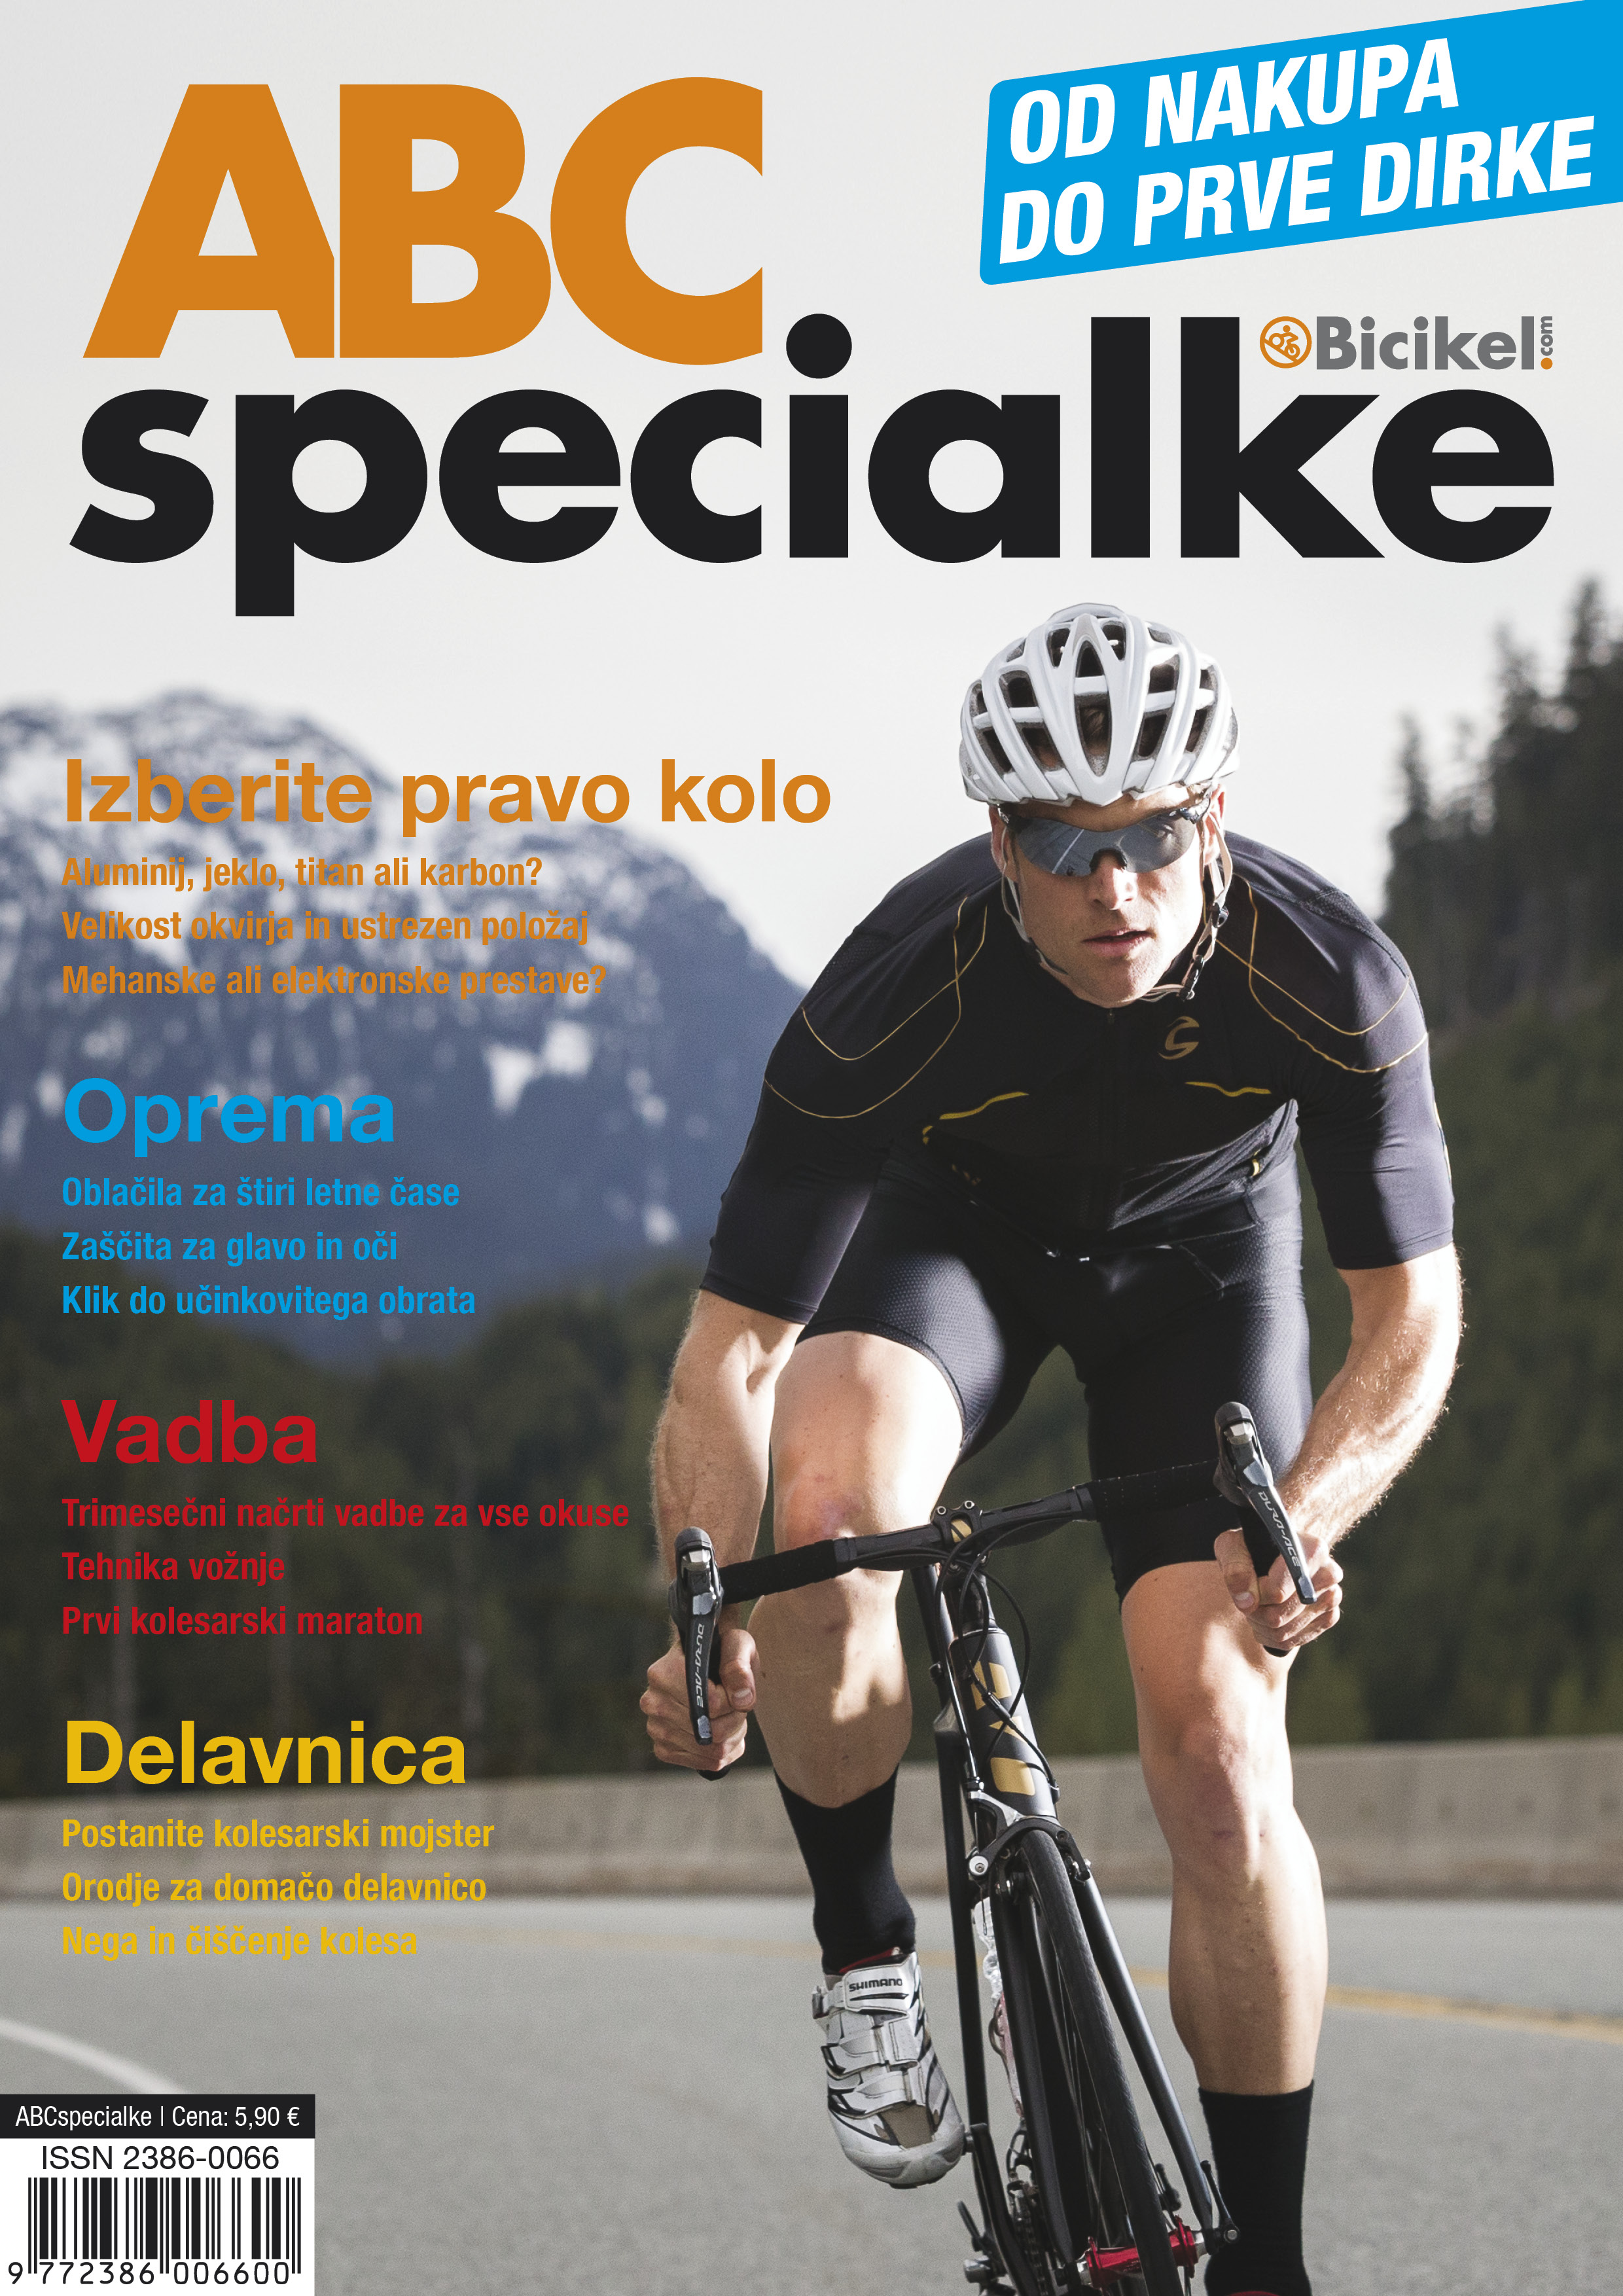 Bicikel.com+ ABCspecialke